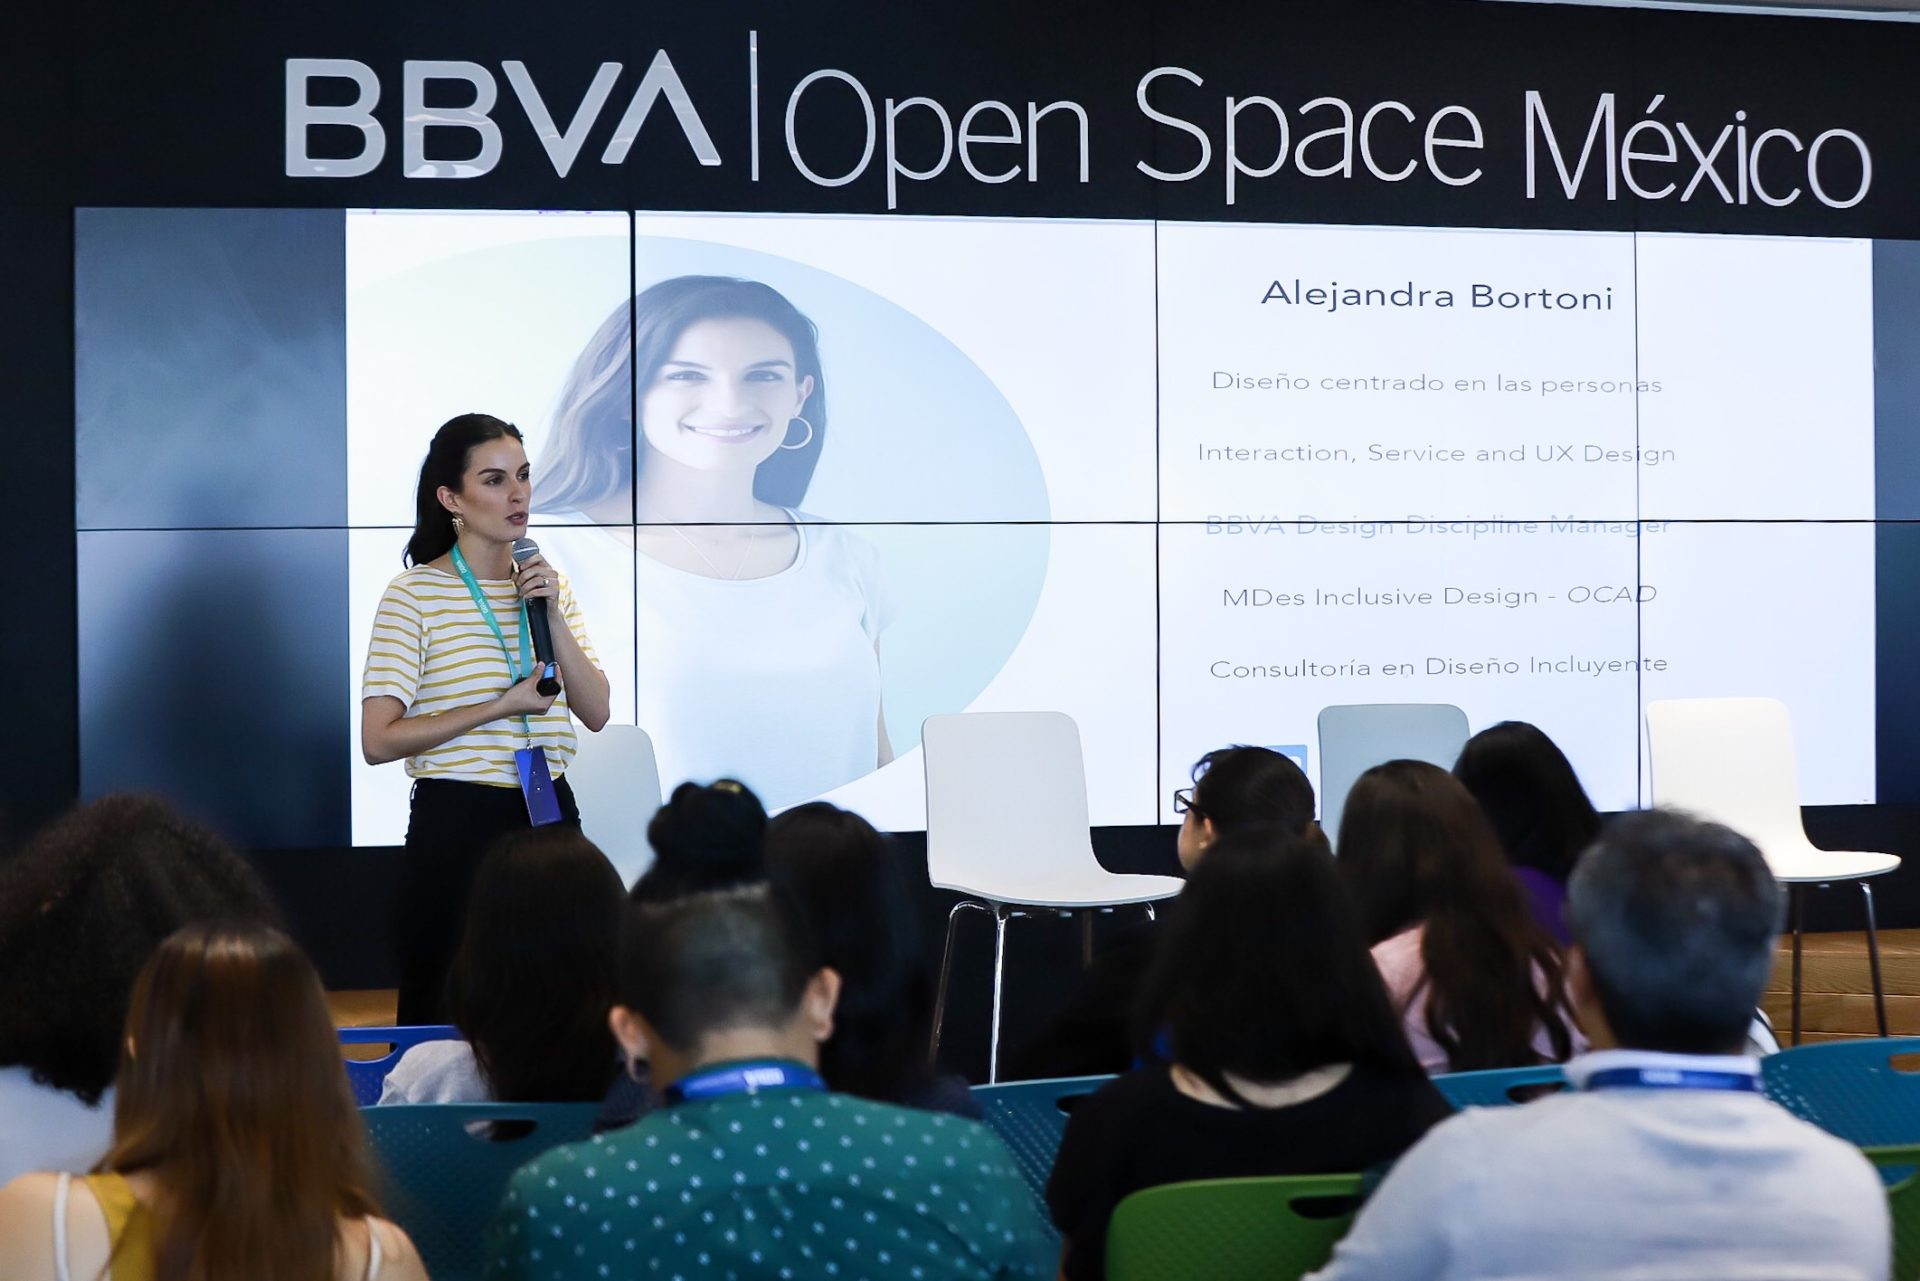 Alejandra Bortoni BBVA Open Space